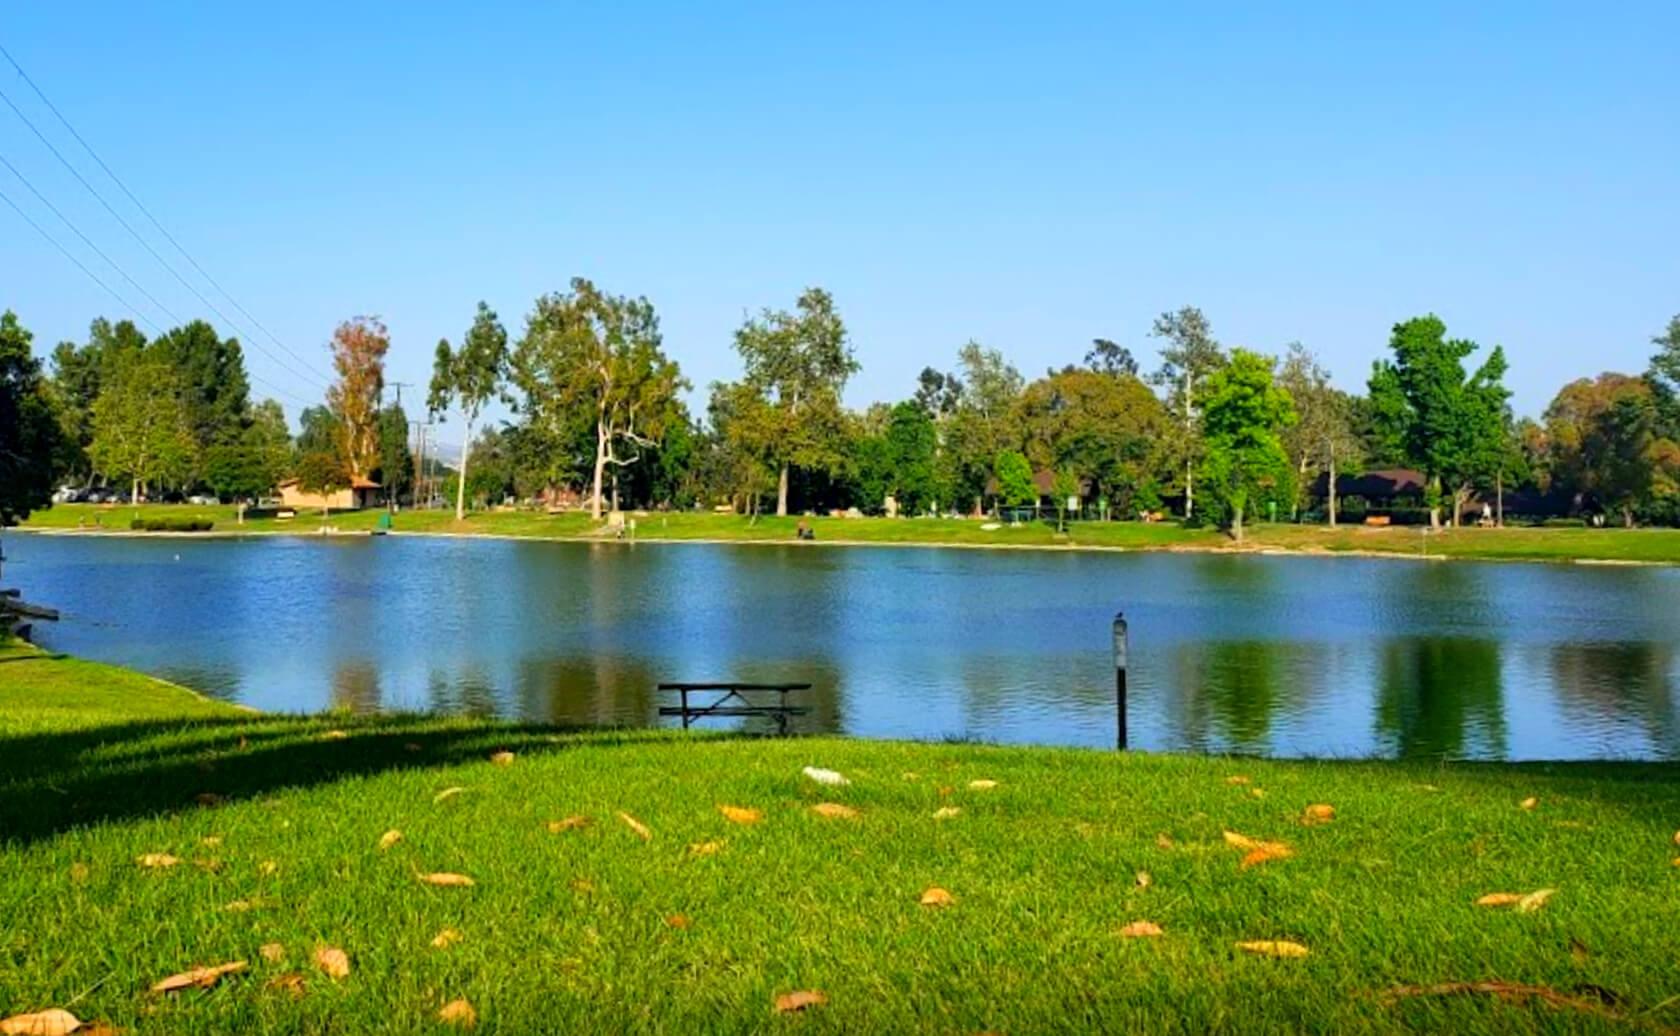 Tri-City-Park-Lake-Fishing-Guide-Report-Placentia-CA-02